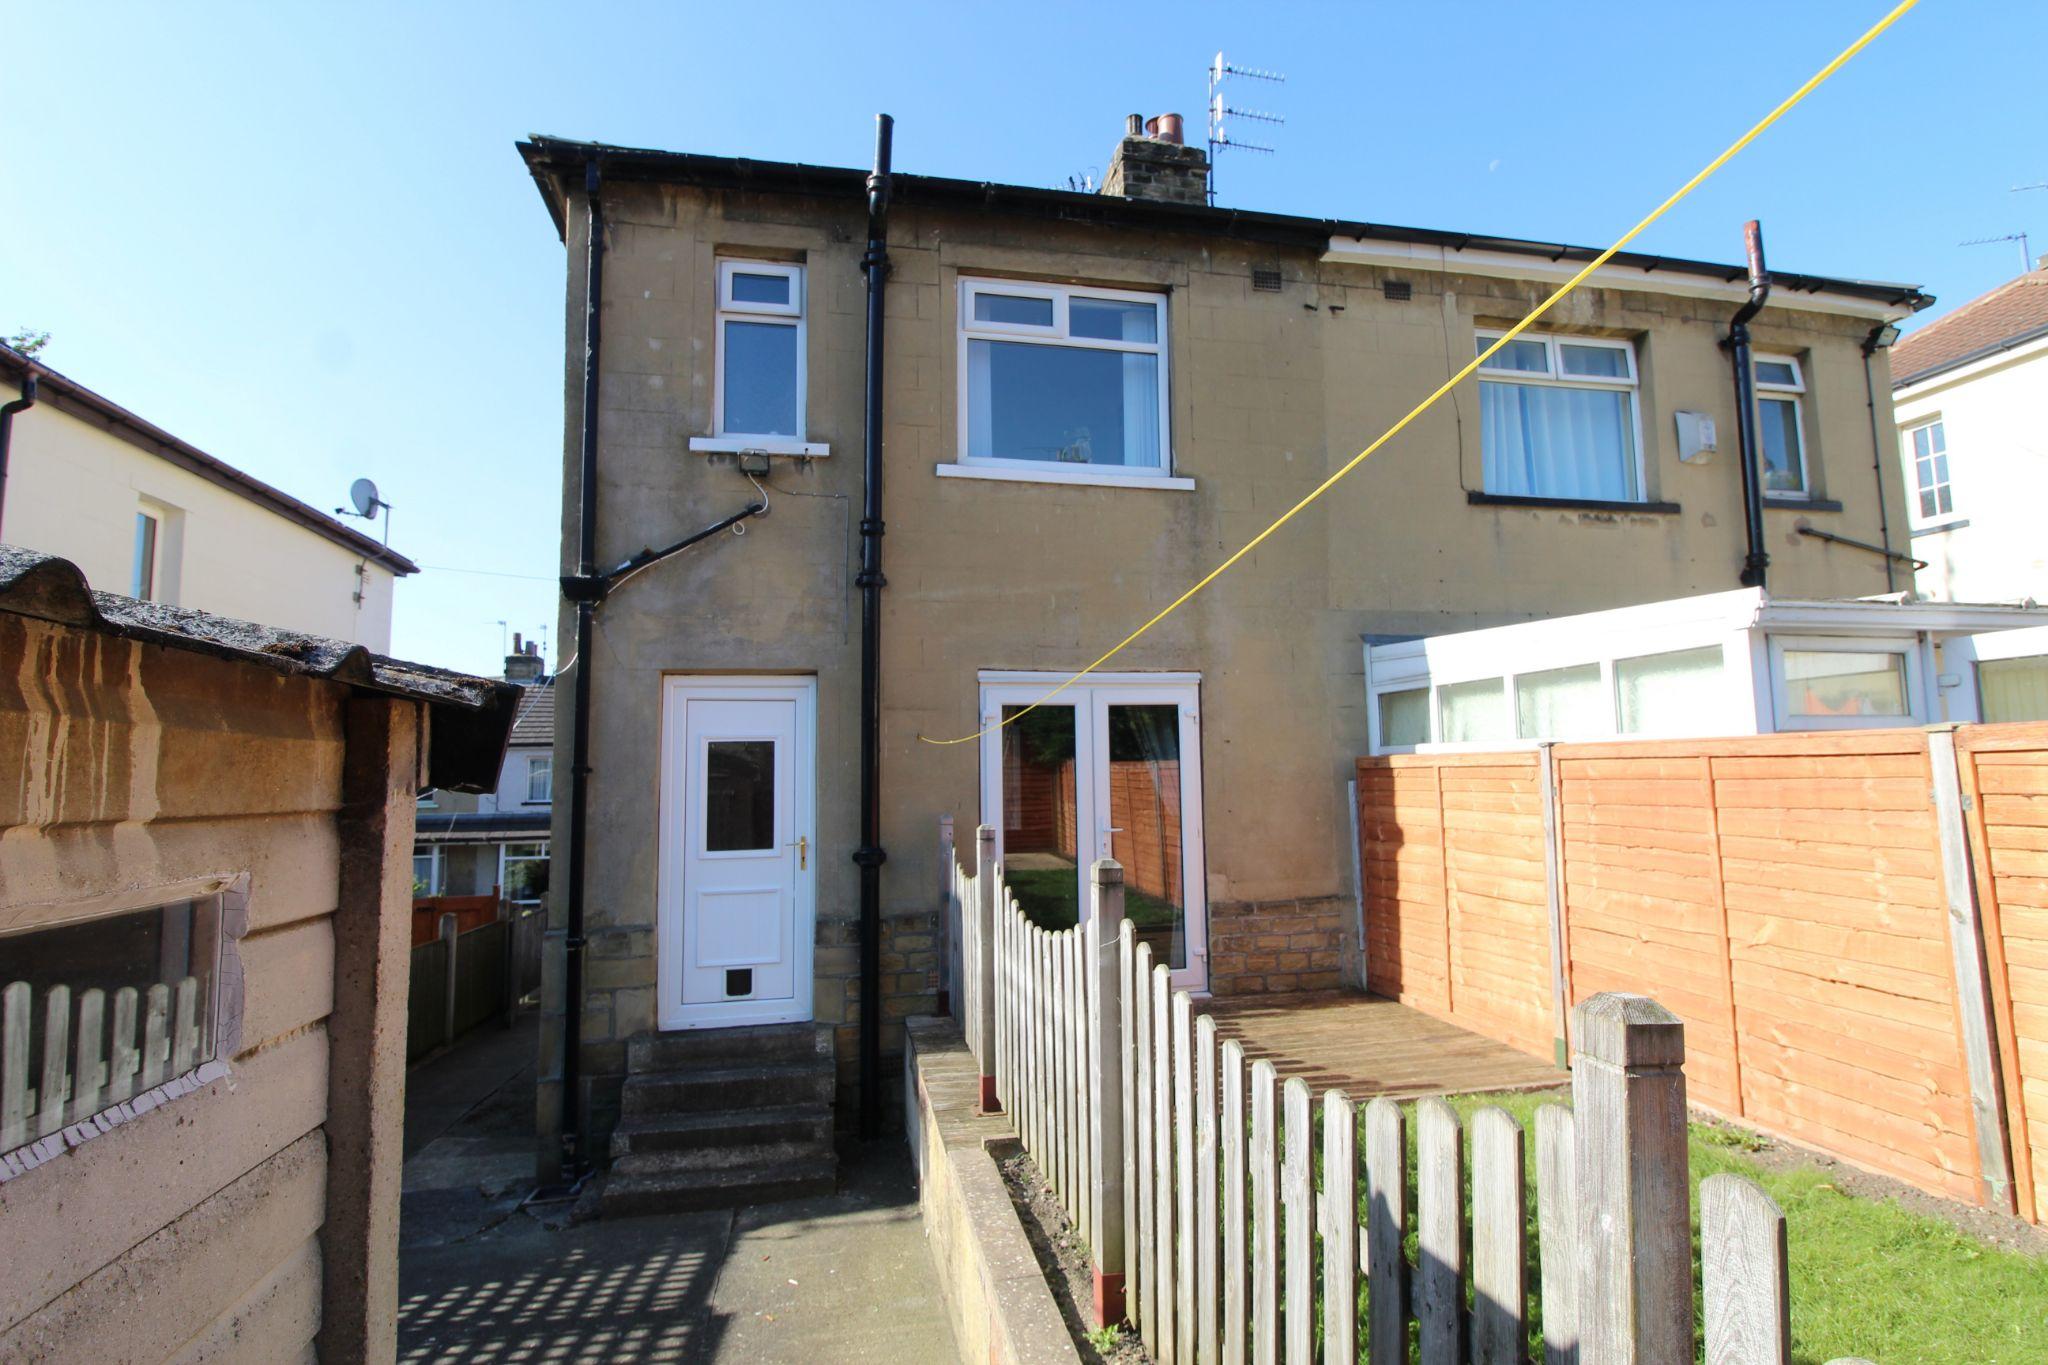 2 bedroom semi-detached house Let in Bradford - Rear aspect